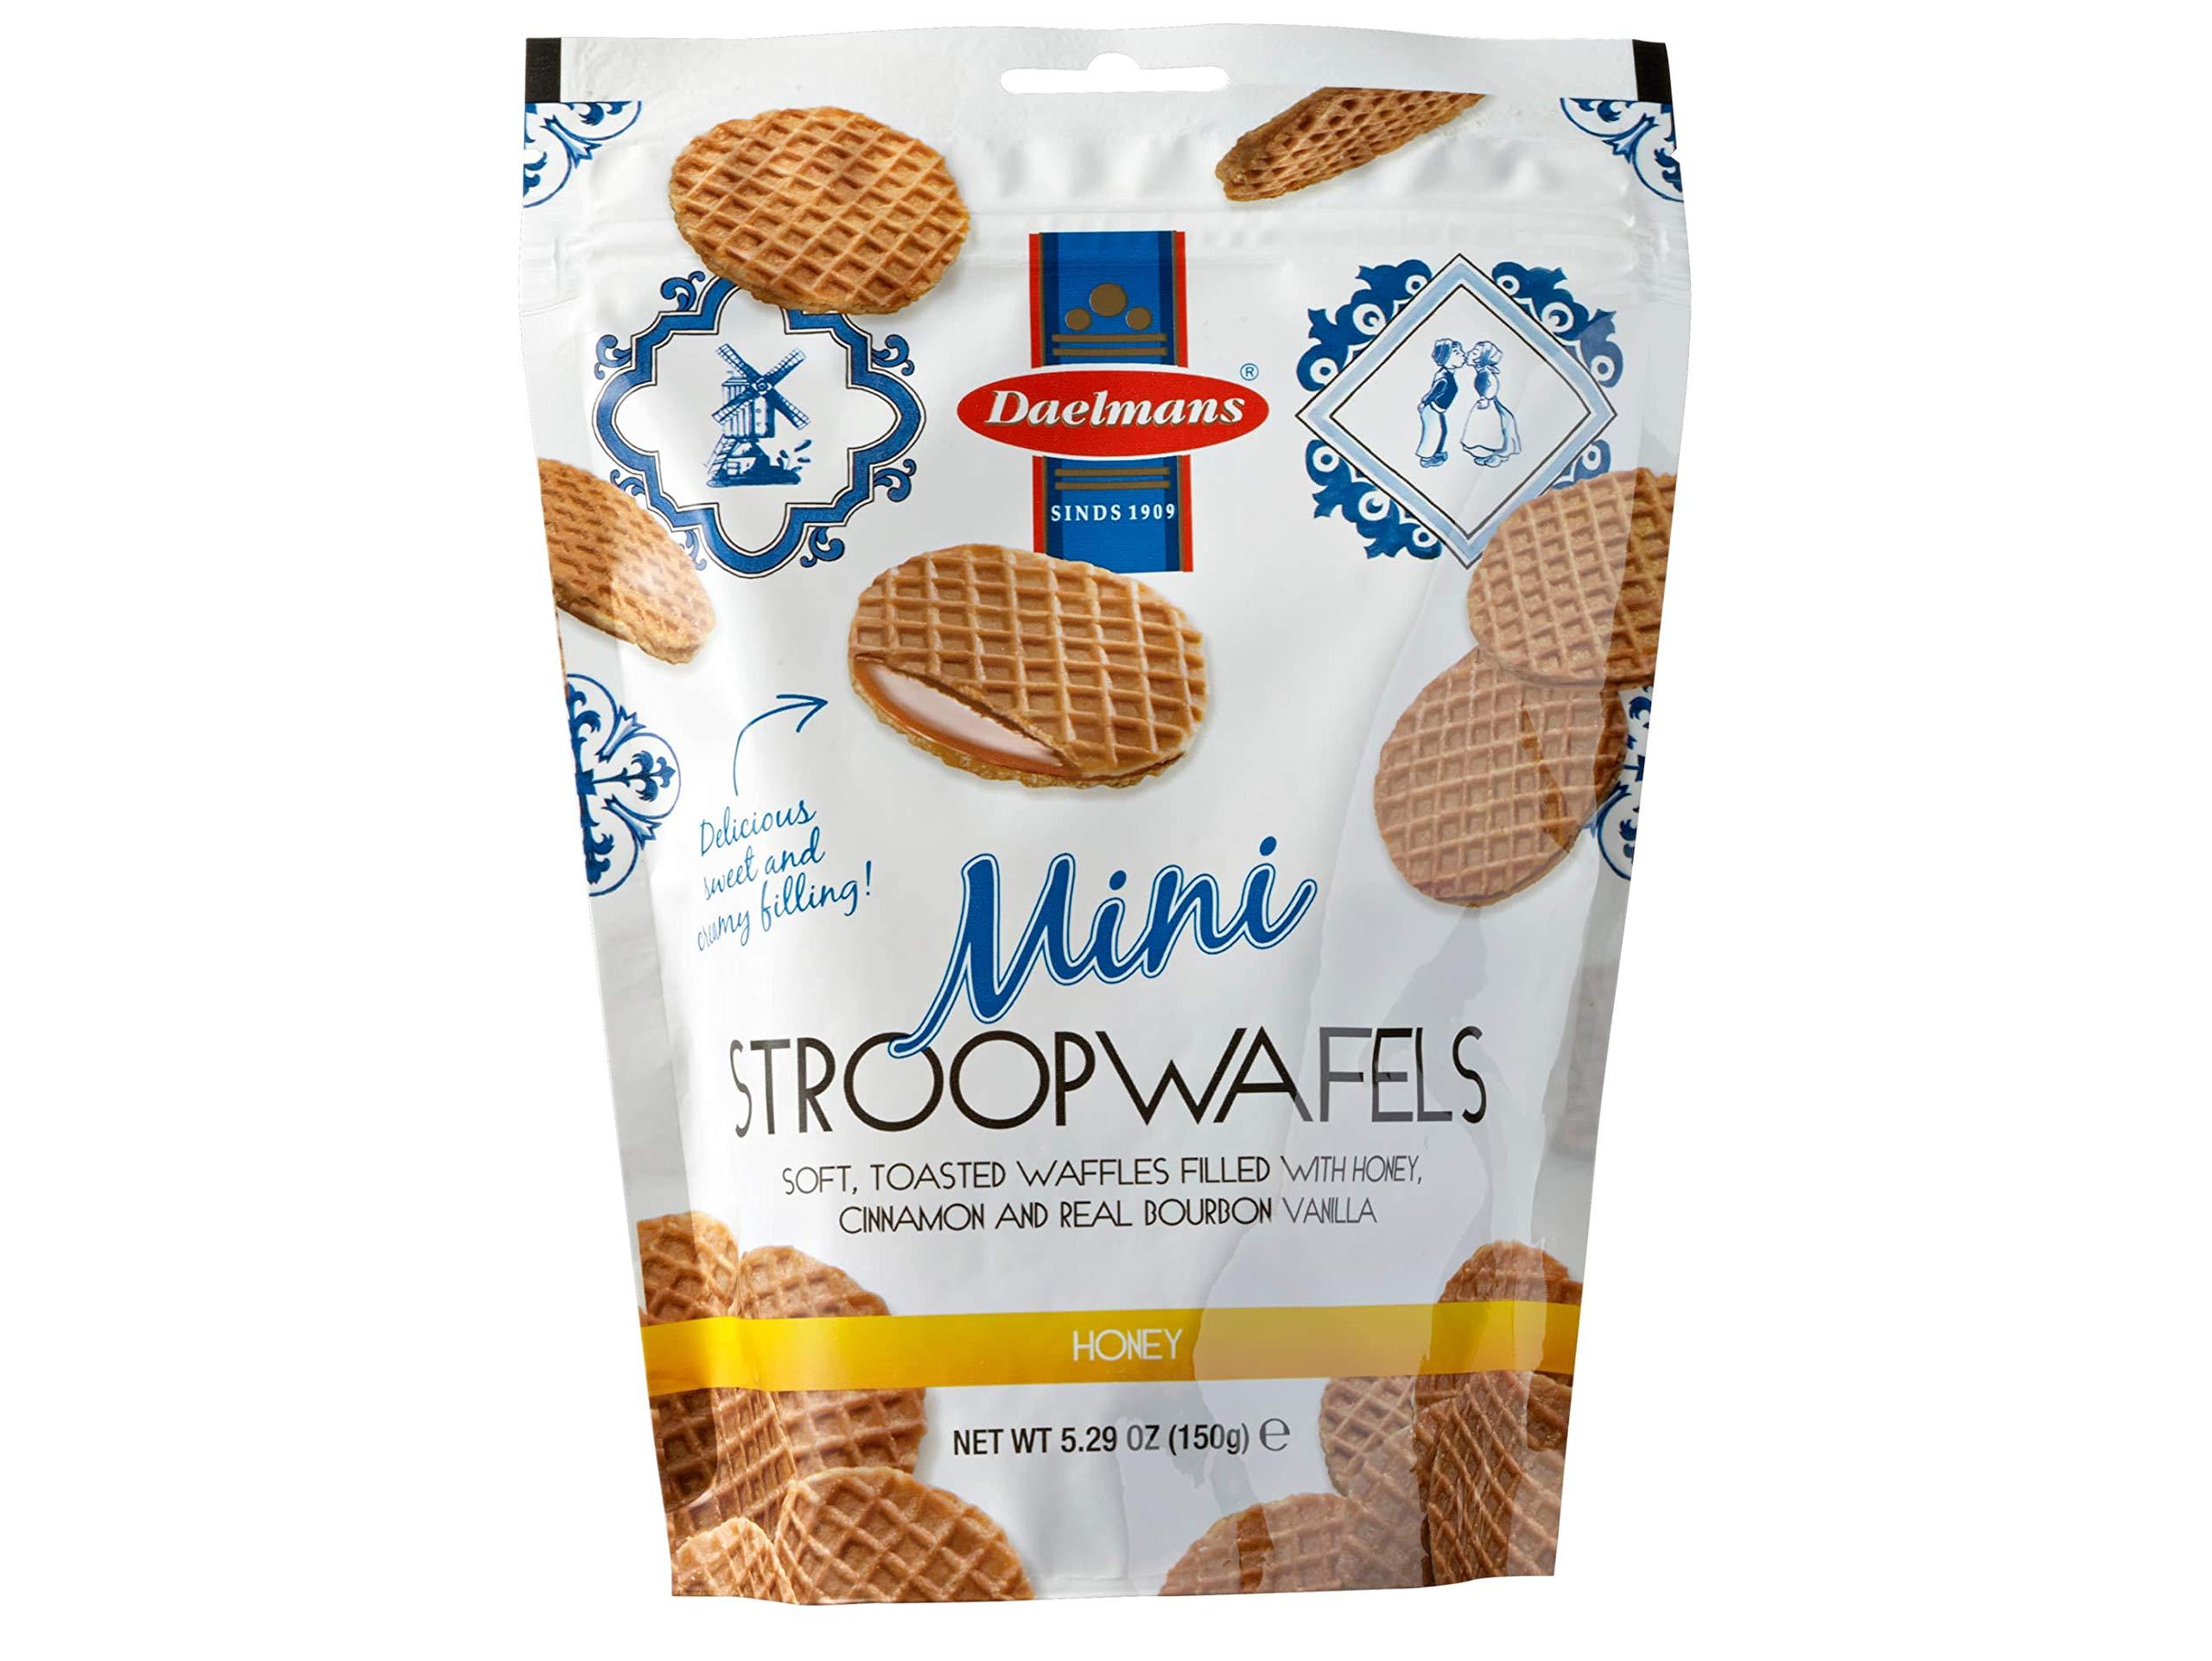 Daelmans Stroopwafel Minis, Honey, 5.29 oz